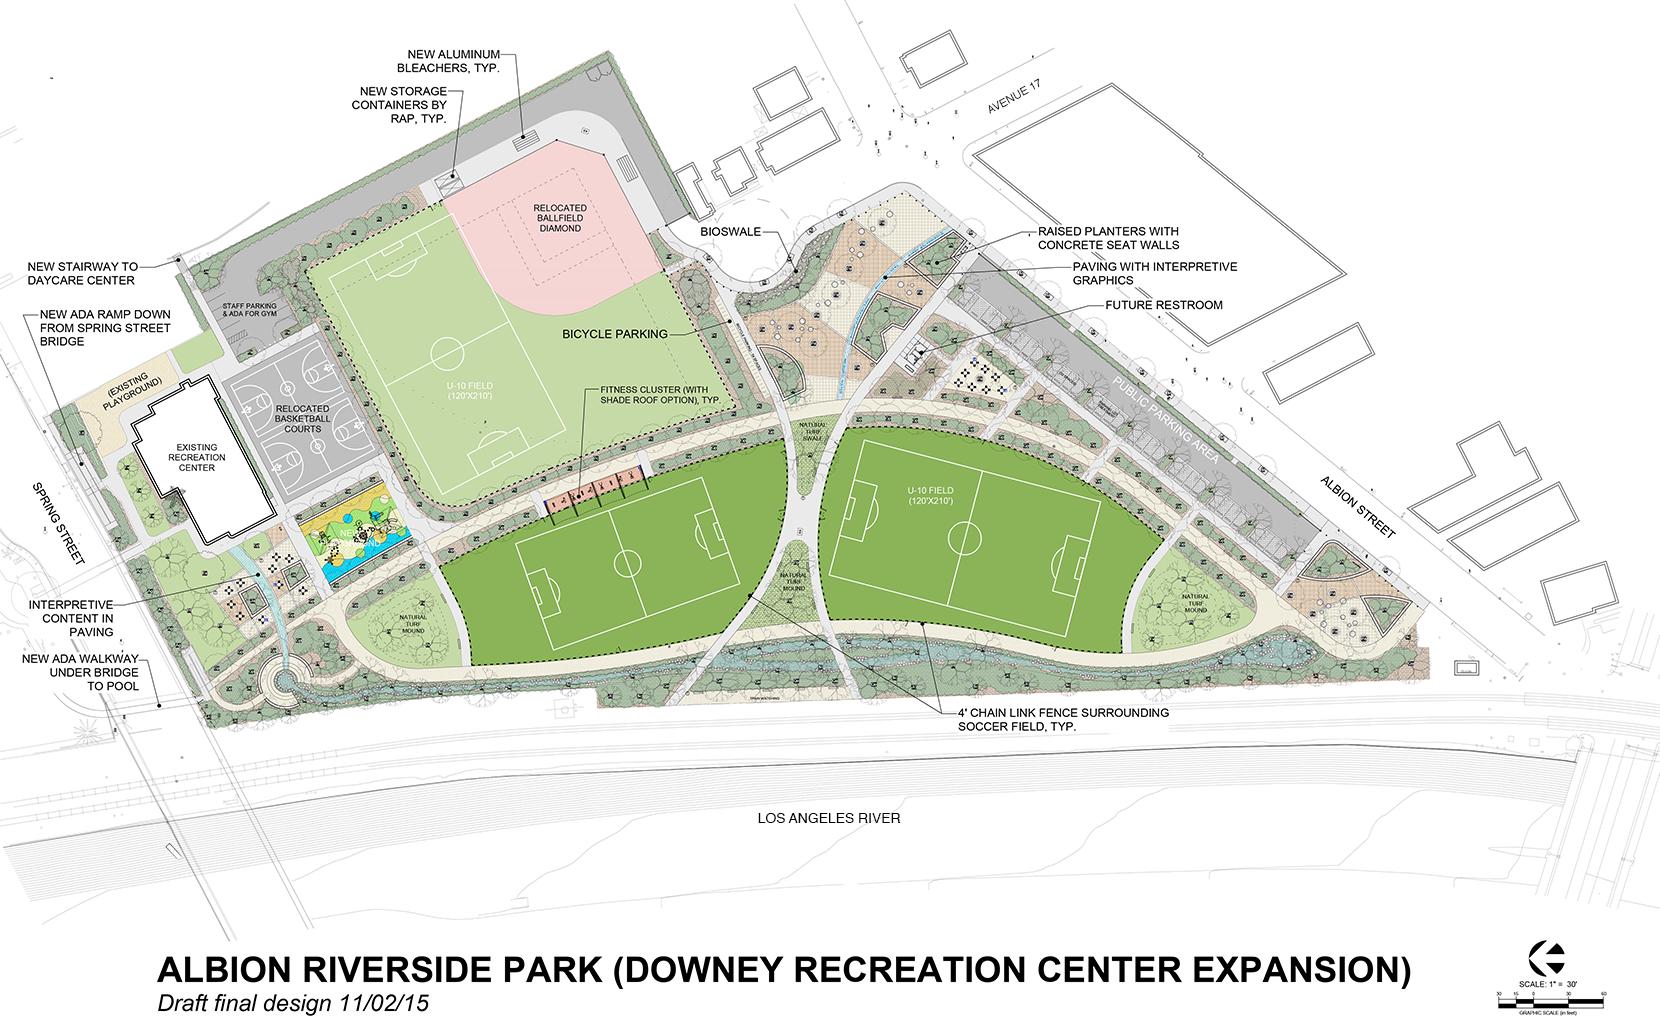 Albion Riverside Park - Draft Final Design